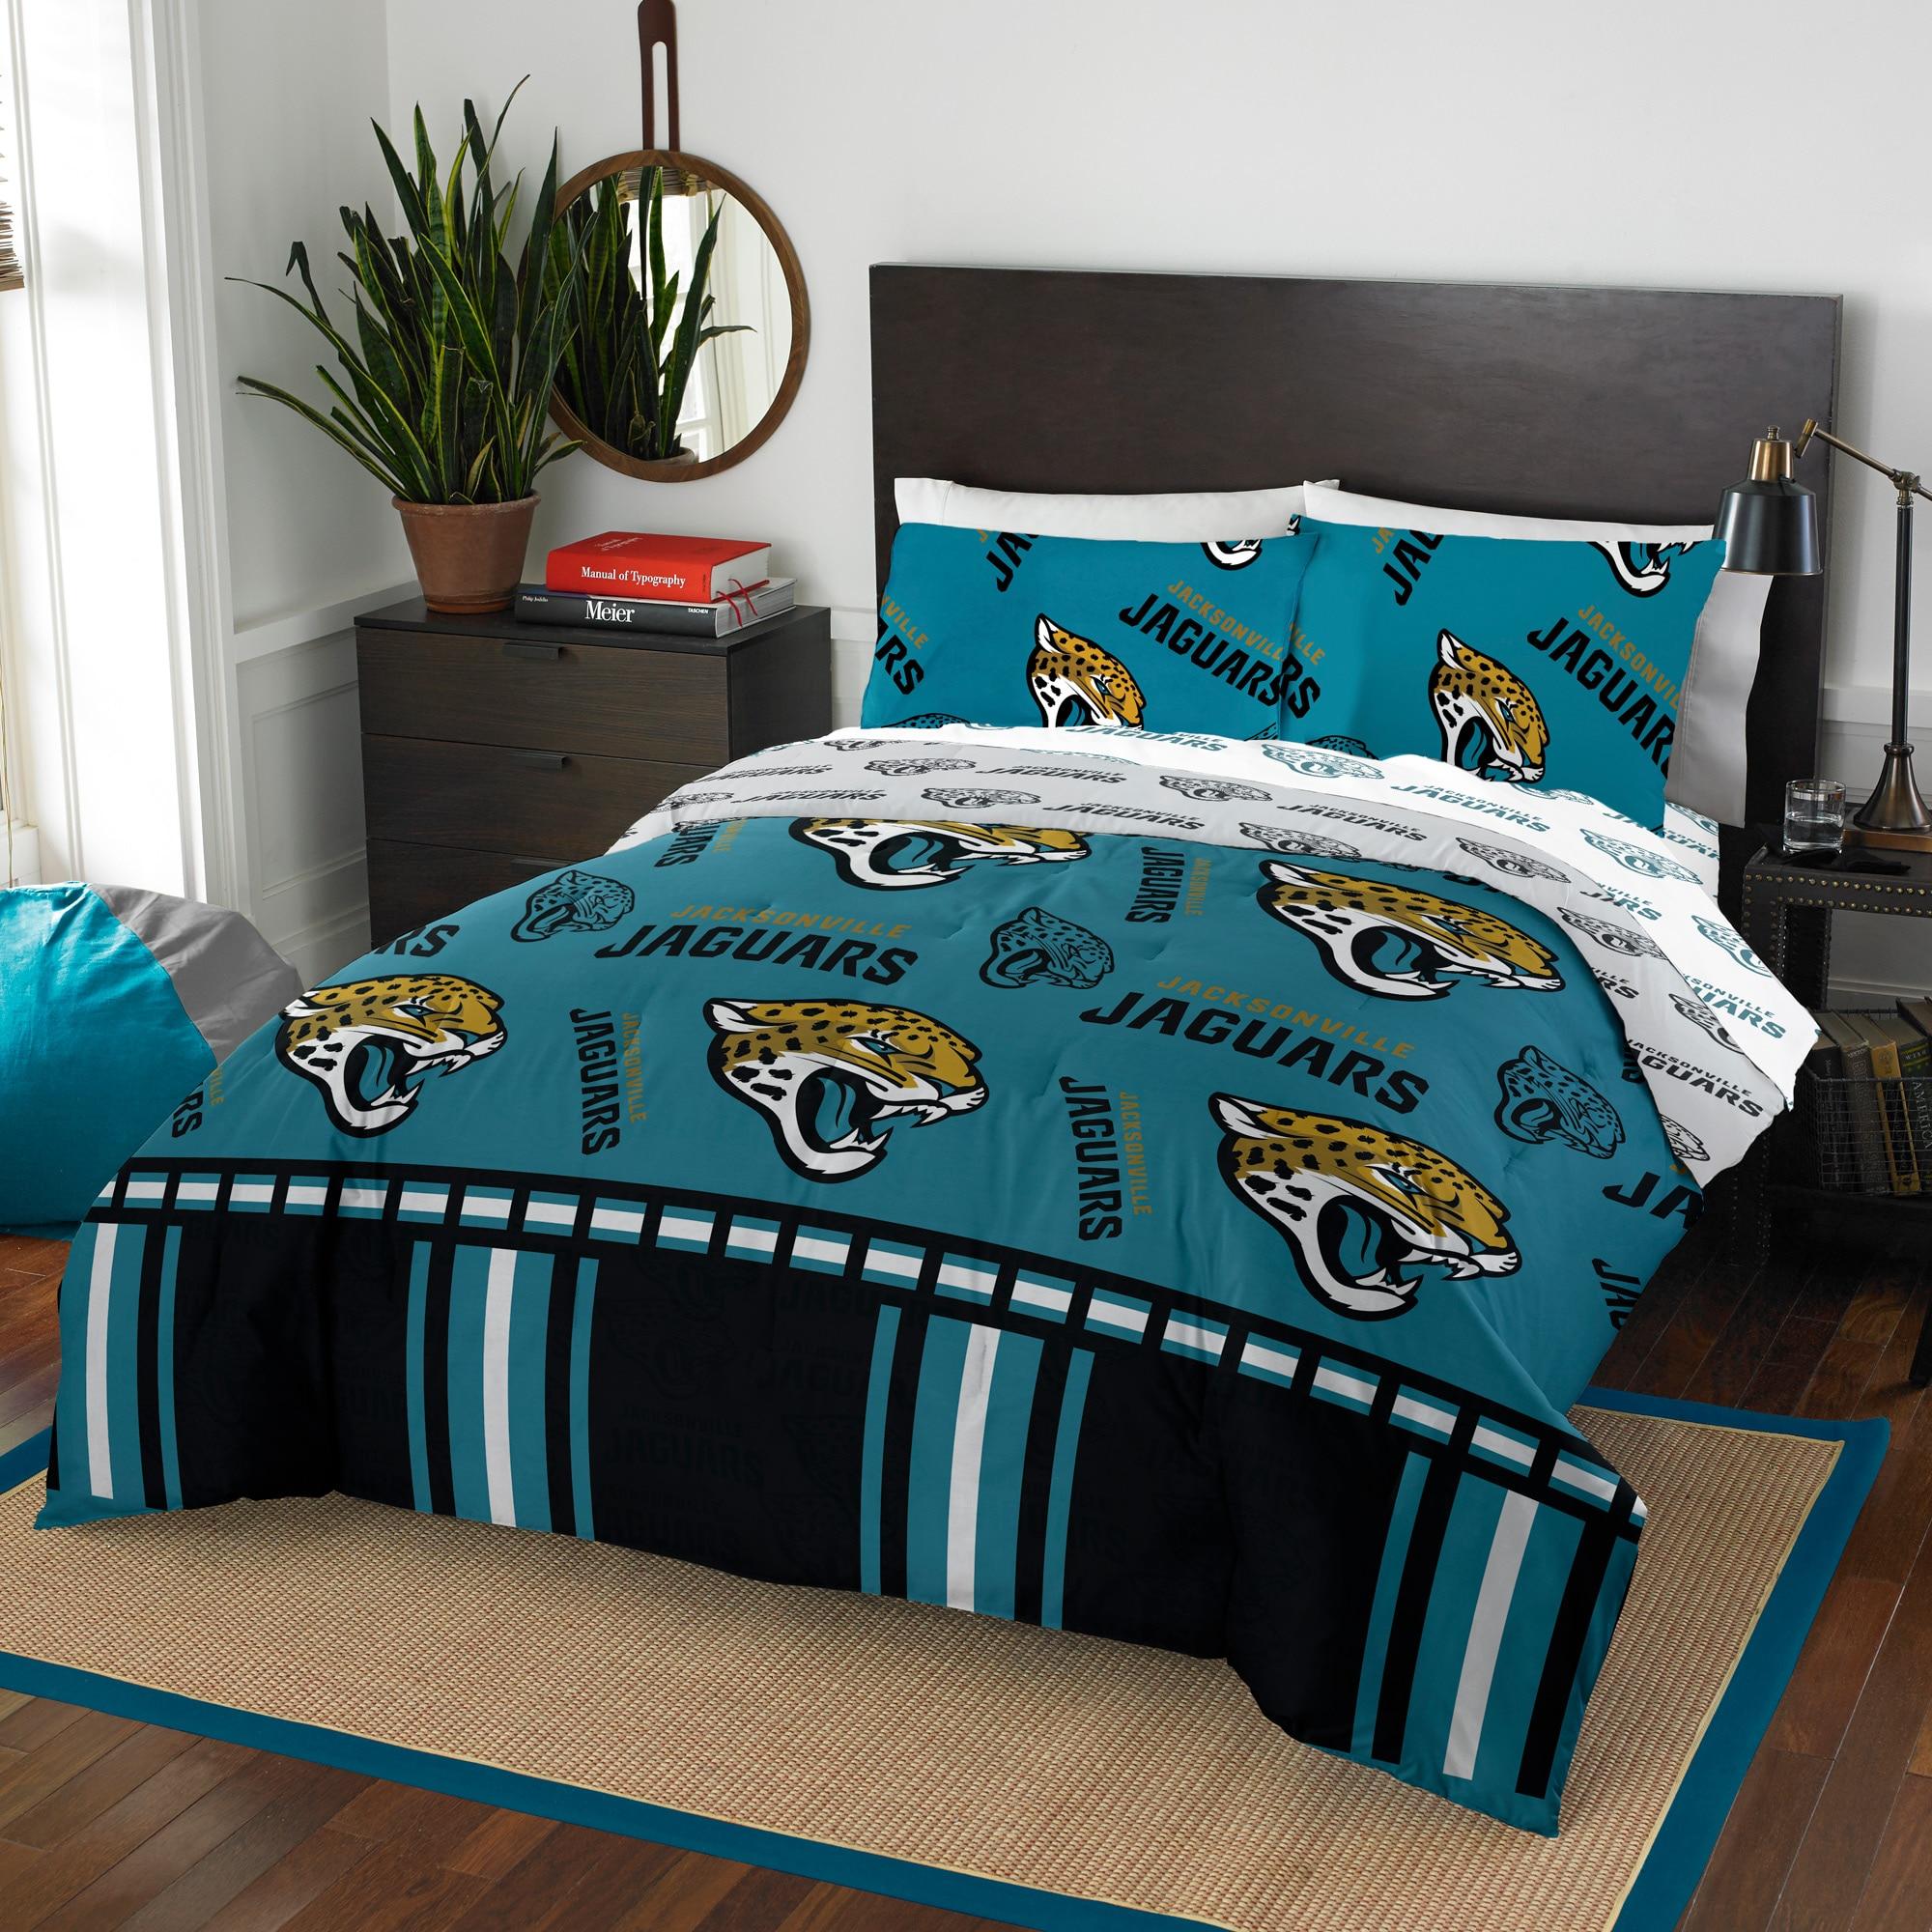 Jacksonville Jaguars The Northwest Company 5-Piece Full Bed in a Bag Set